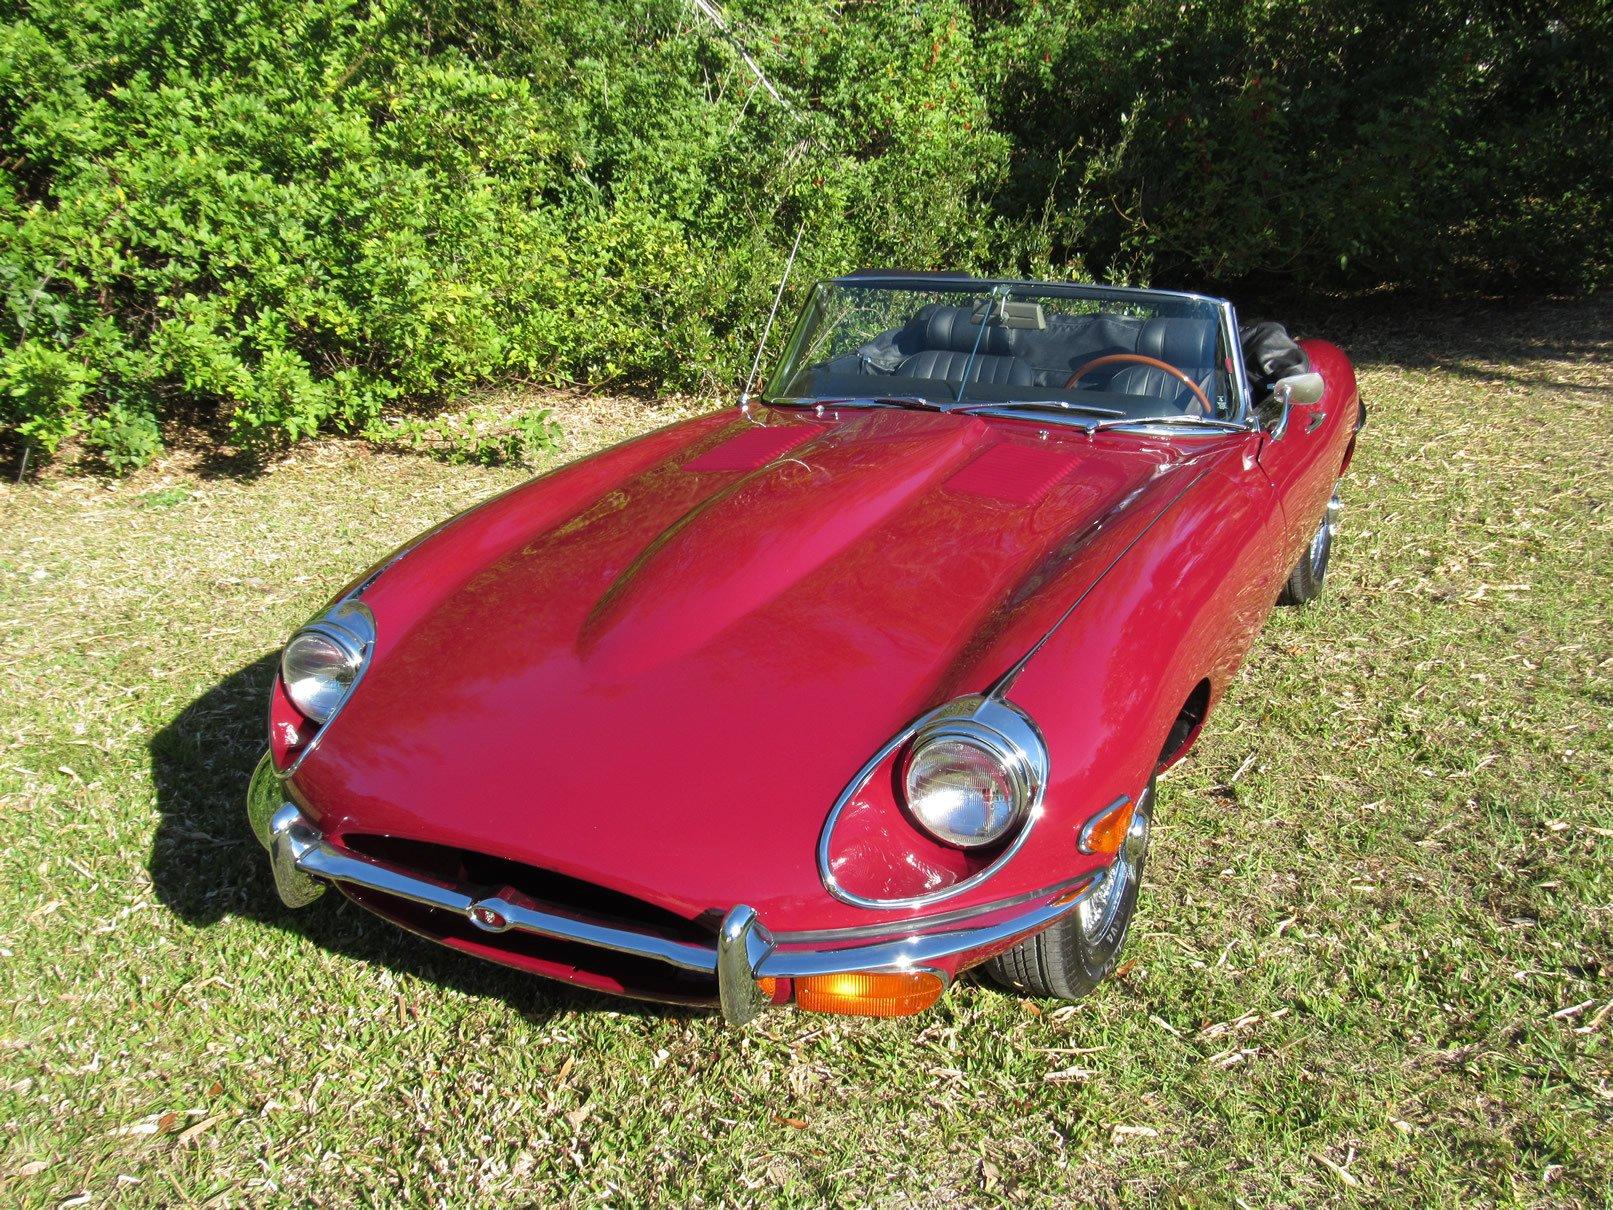 1969 jaguar series ii e type roadster